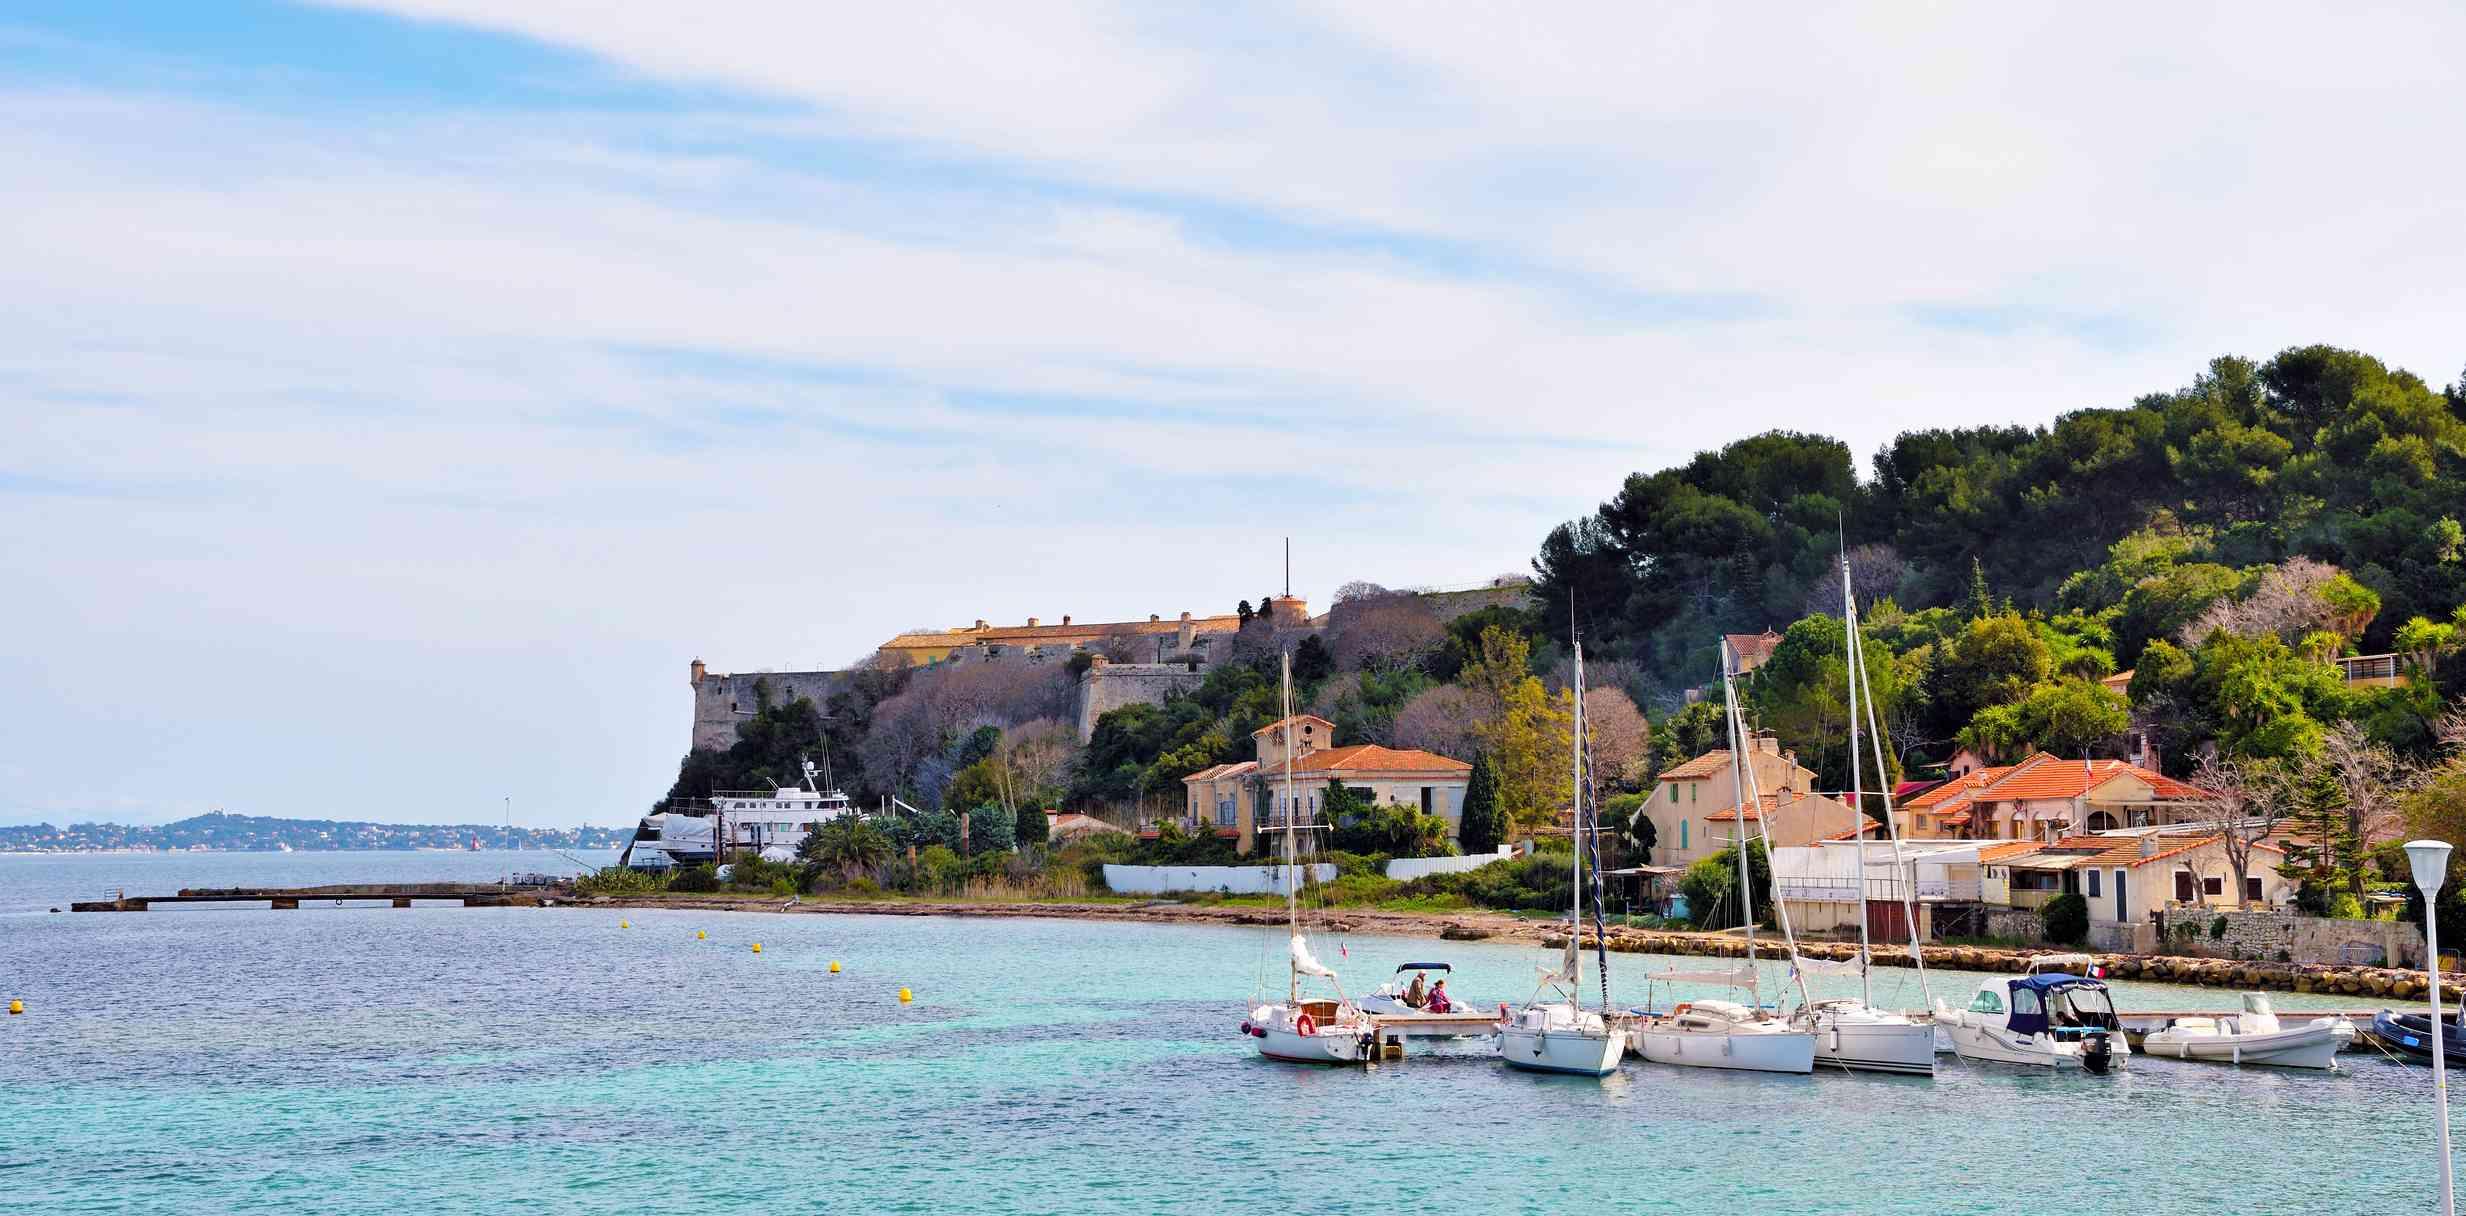 Sainte-Marguerite Island, France